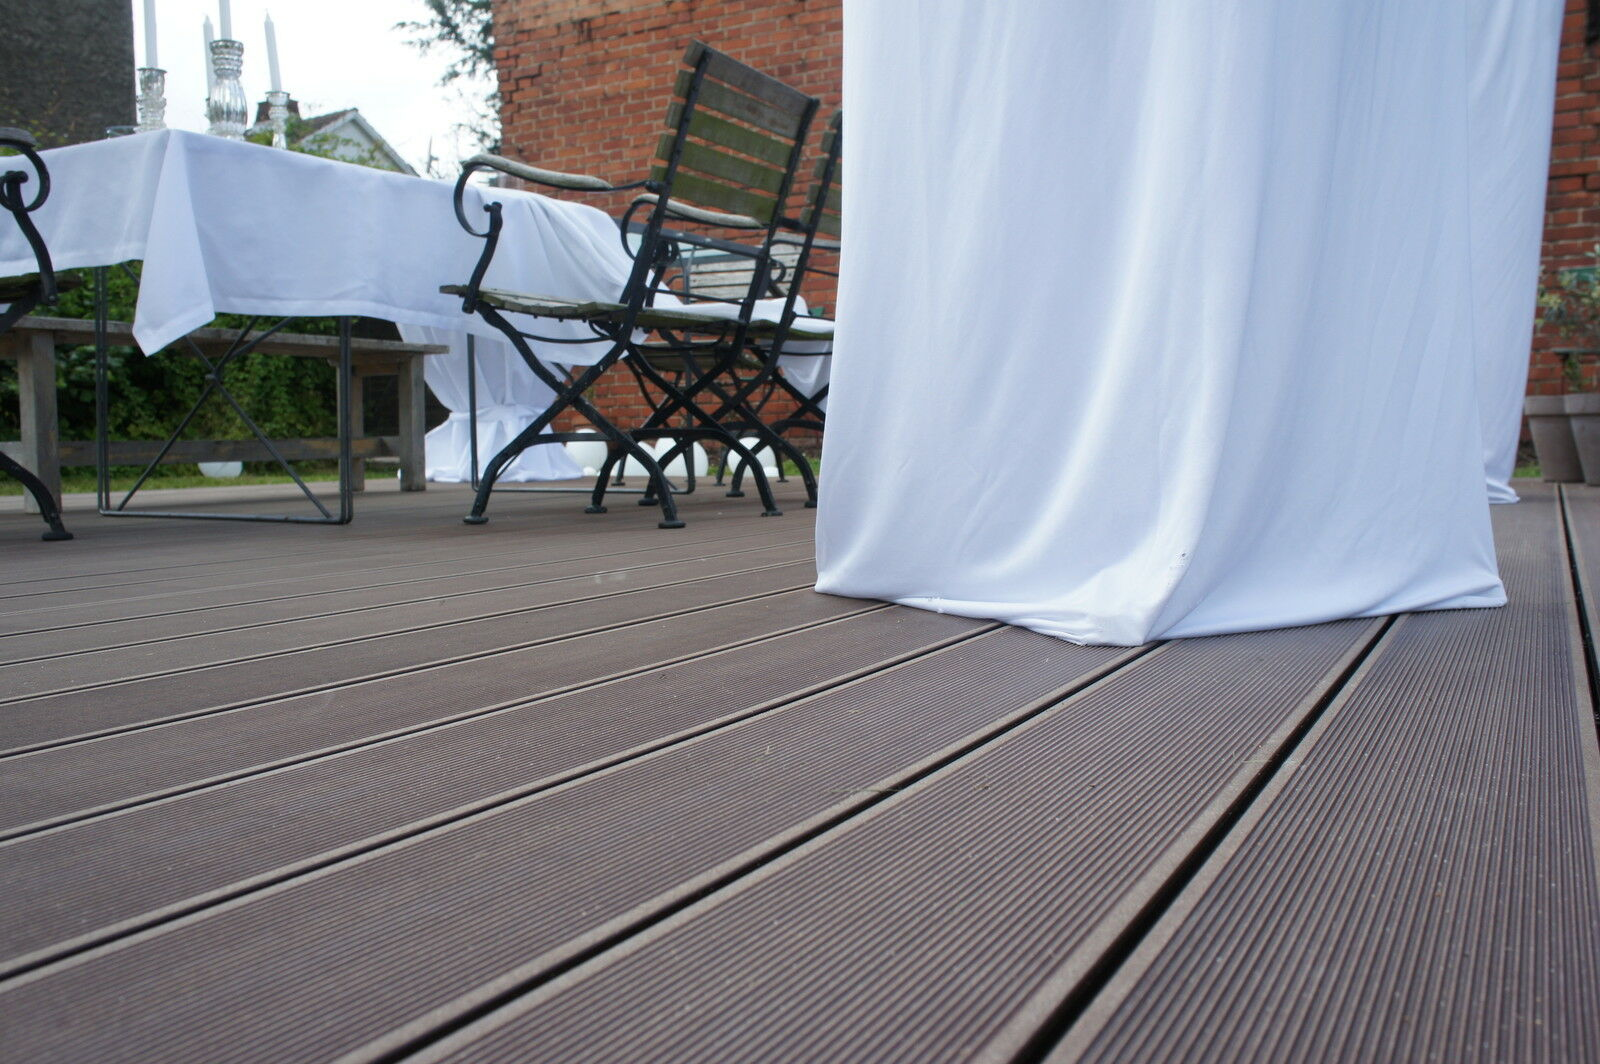 wpc terrassendielen 30 qm komplett bausatz diele dielen holz terrassendiele eur. Black Bedroom Furniture Sets. Home Design Ideas